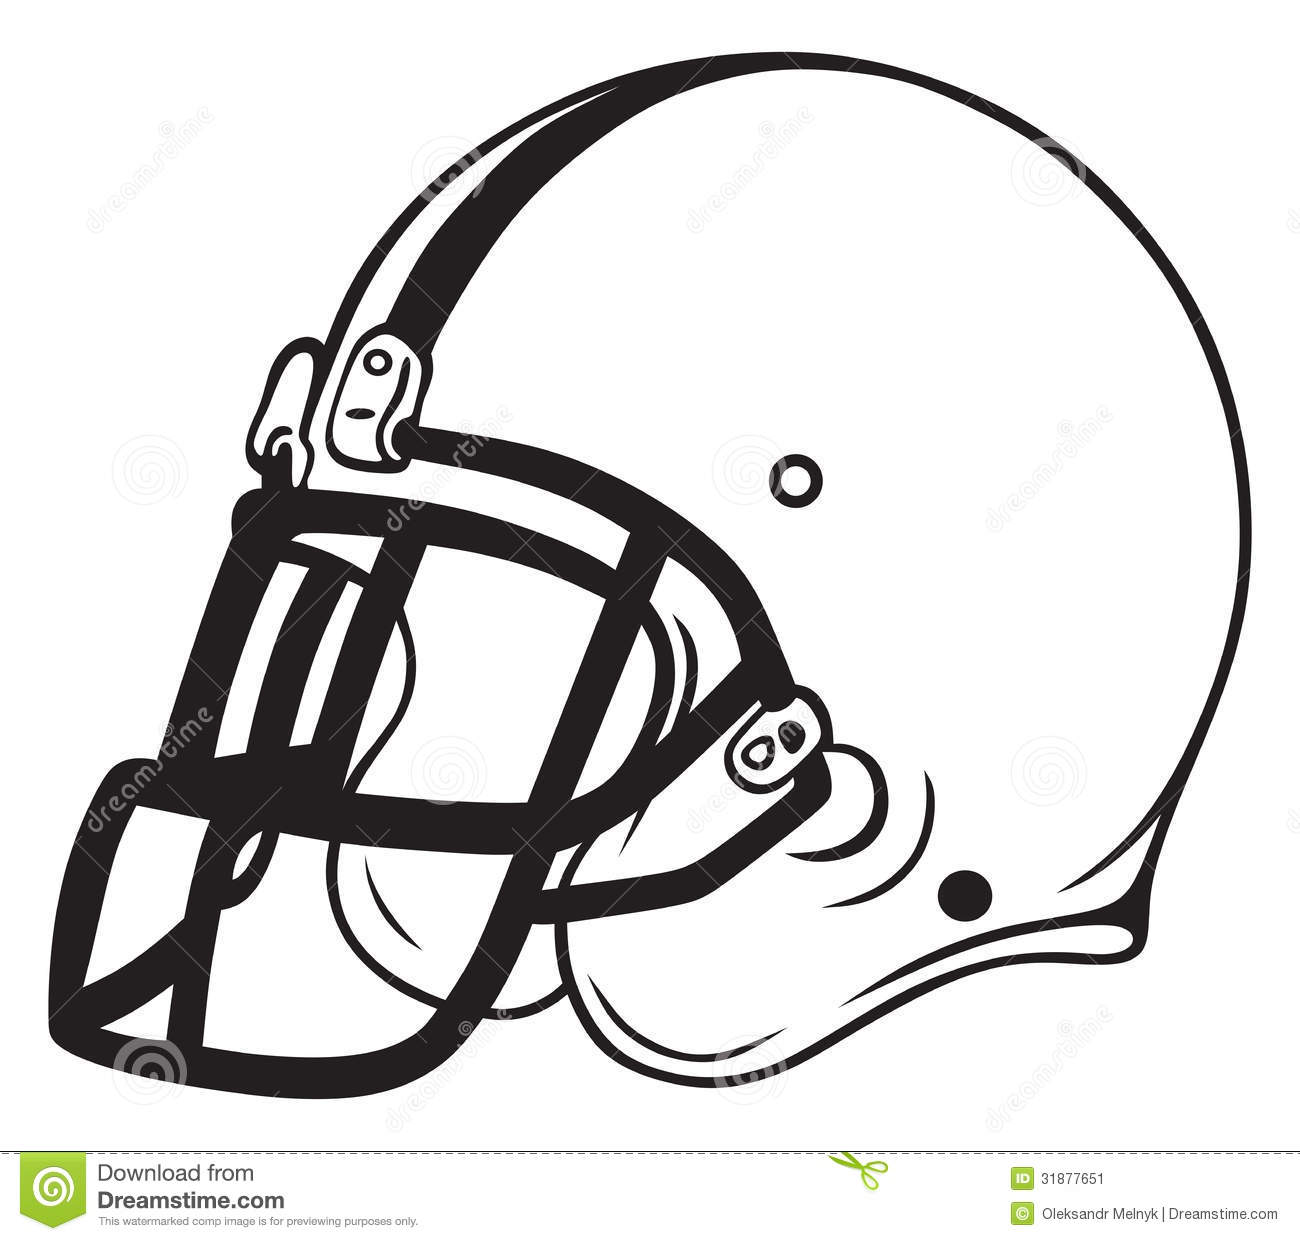 Black football helmet clipart .